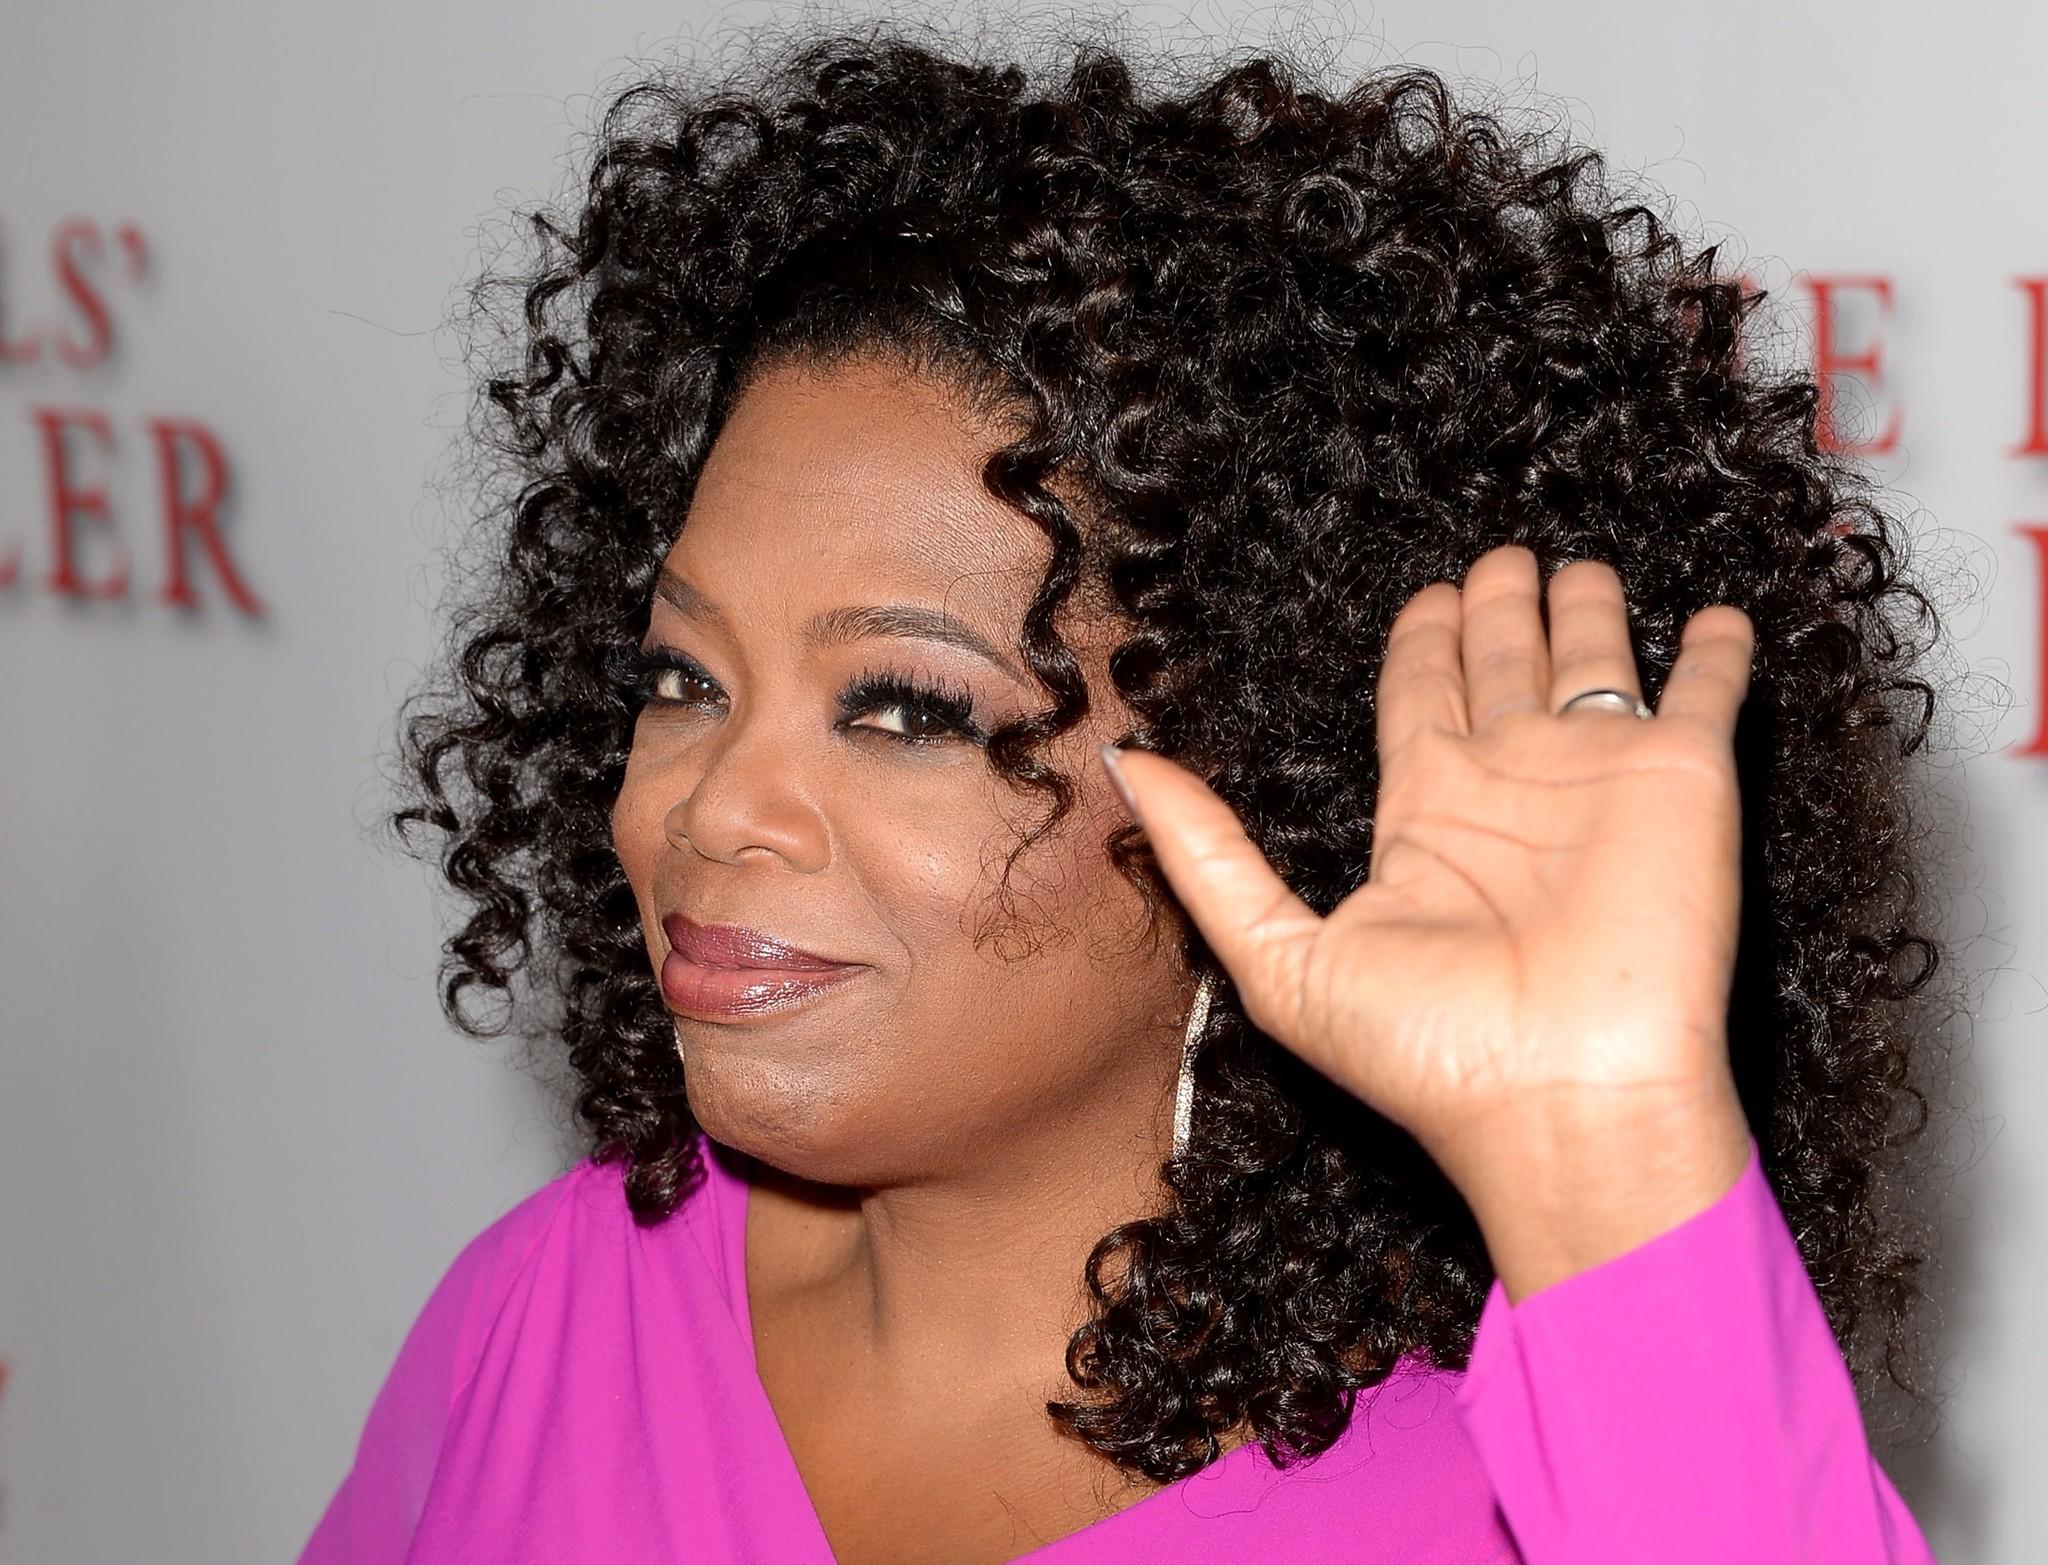 Oprah Winfrey Gives Away A Car Again On Jimmy Kimmel Live